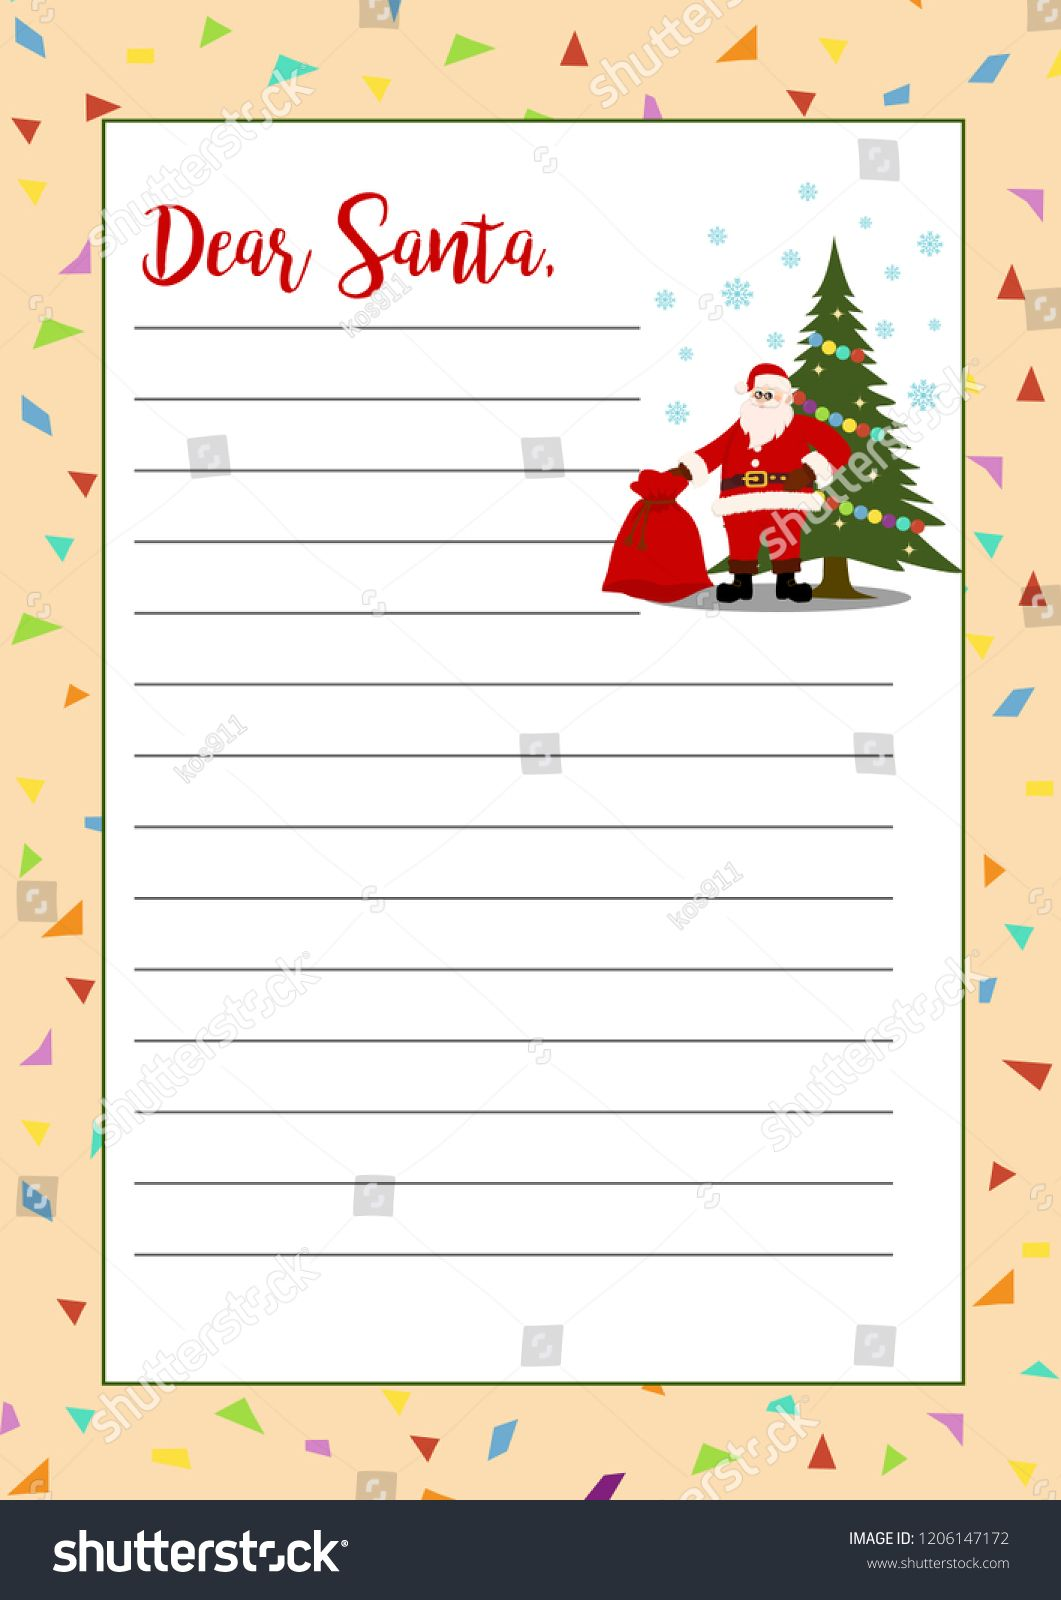 Stokovaya Vektornaya Grafika Christmas Letter Santa Claus Regarding Christmas Note Card Templates Christmas Note Cards Holiday Card Template Note Card Template